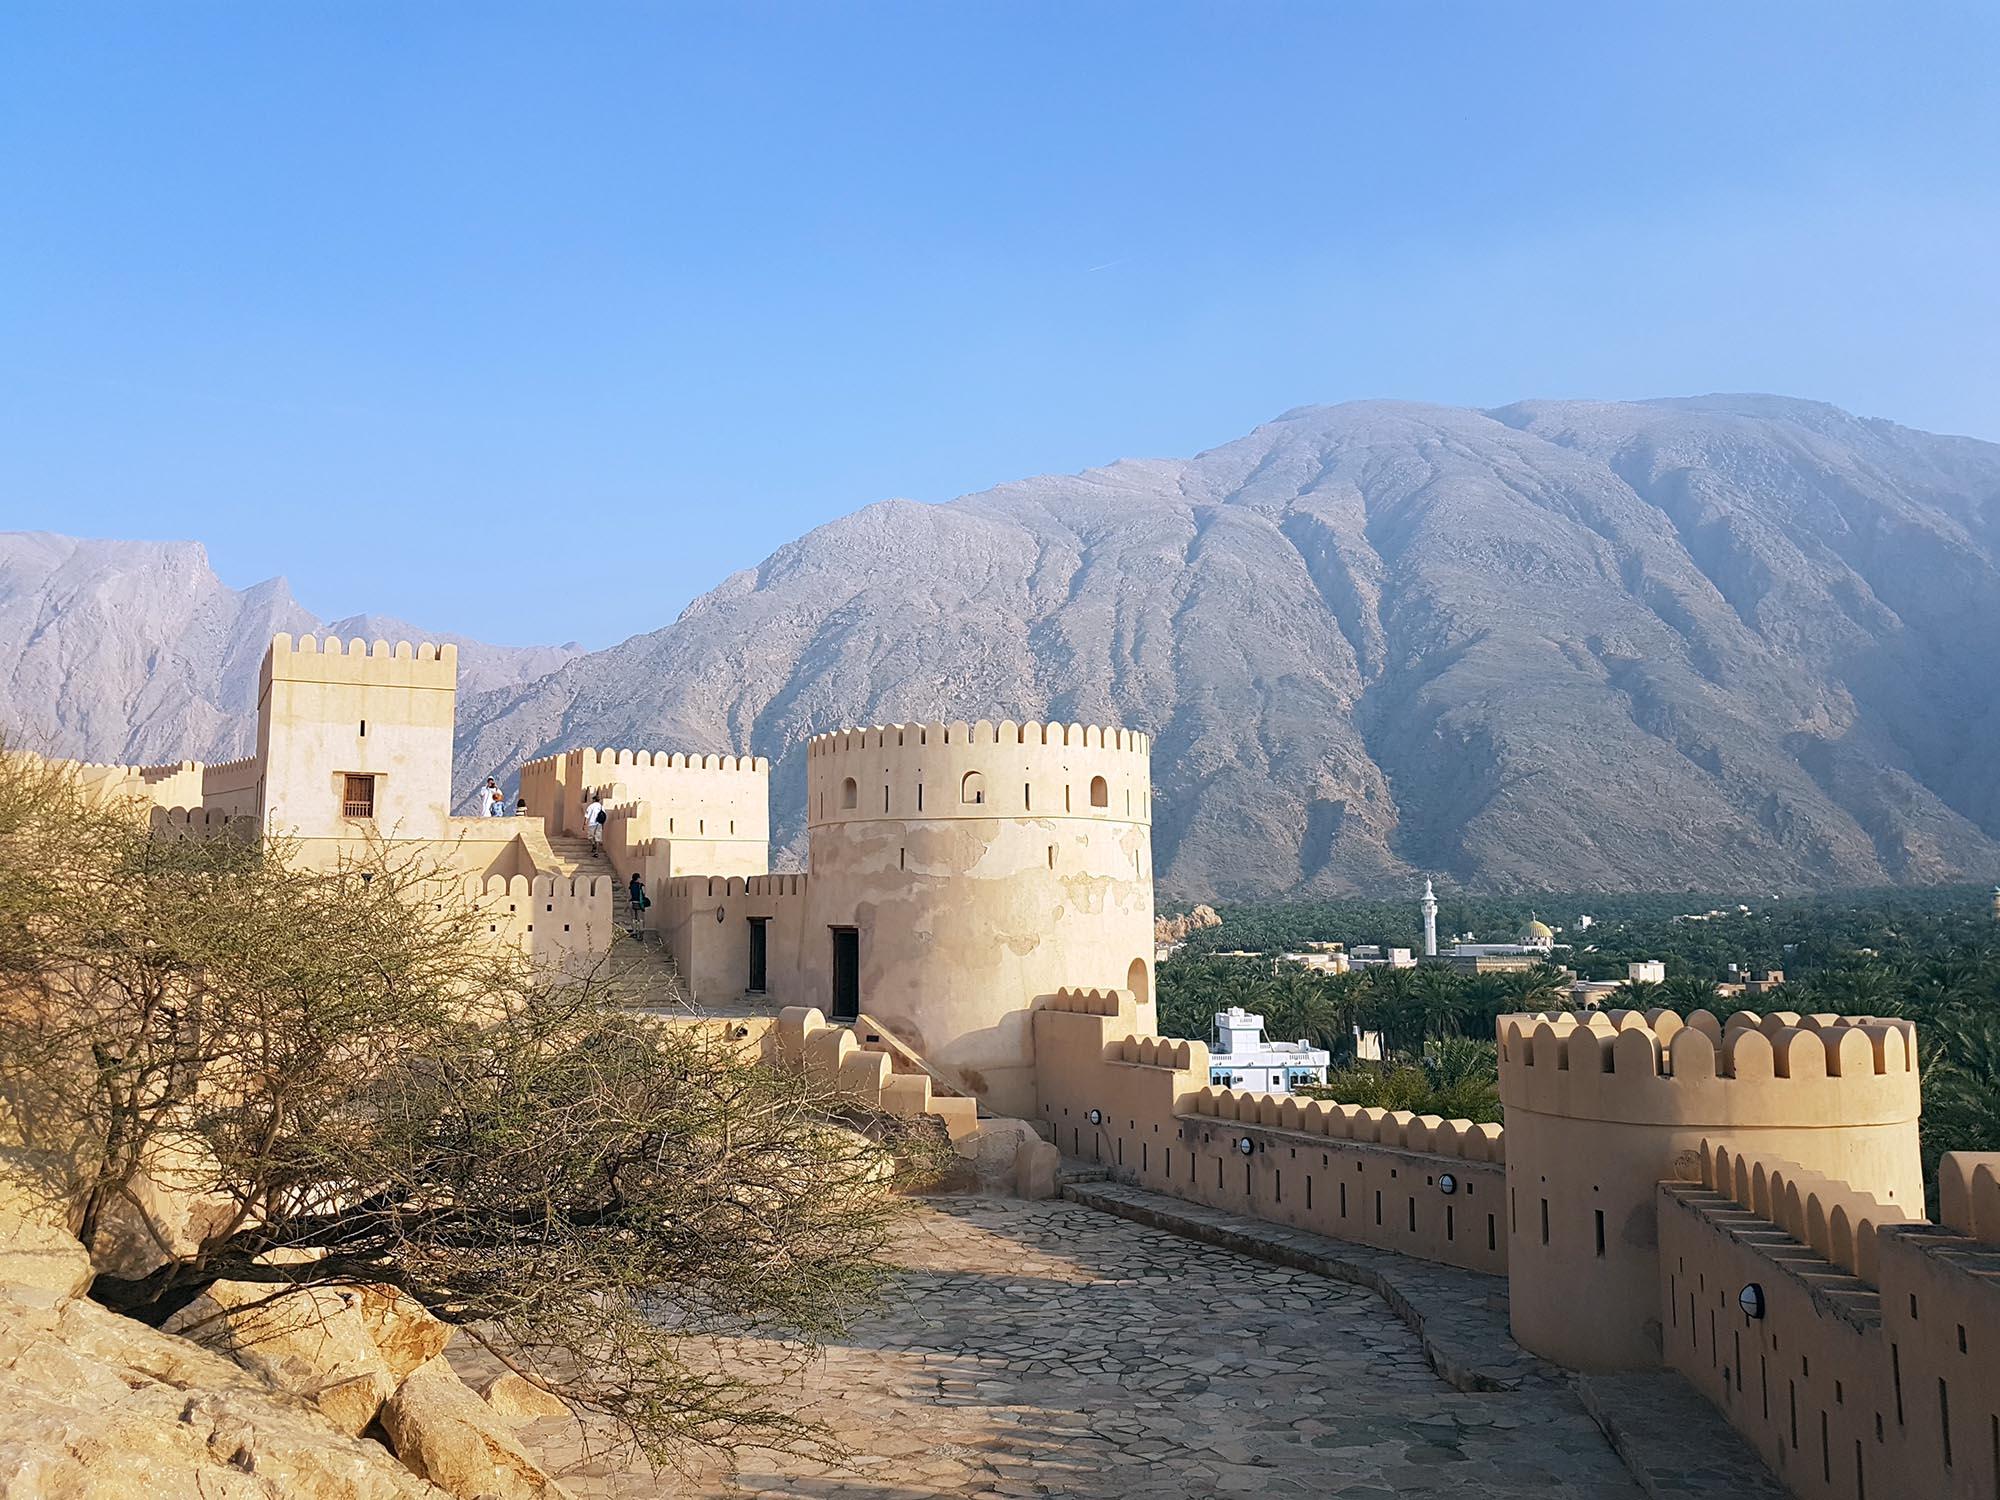 EN [Favoriete reizen] Oman